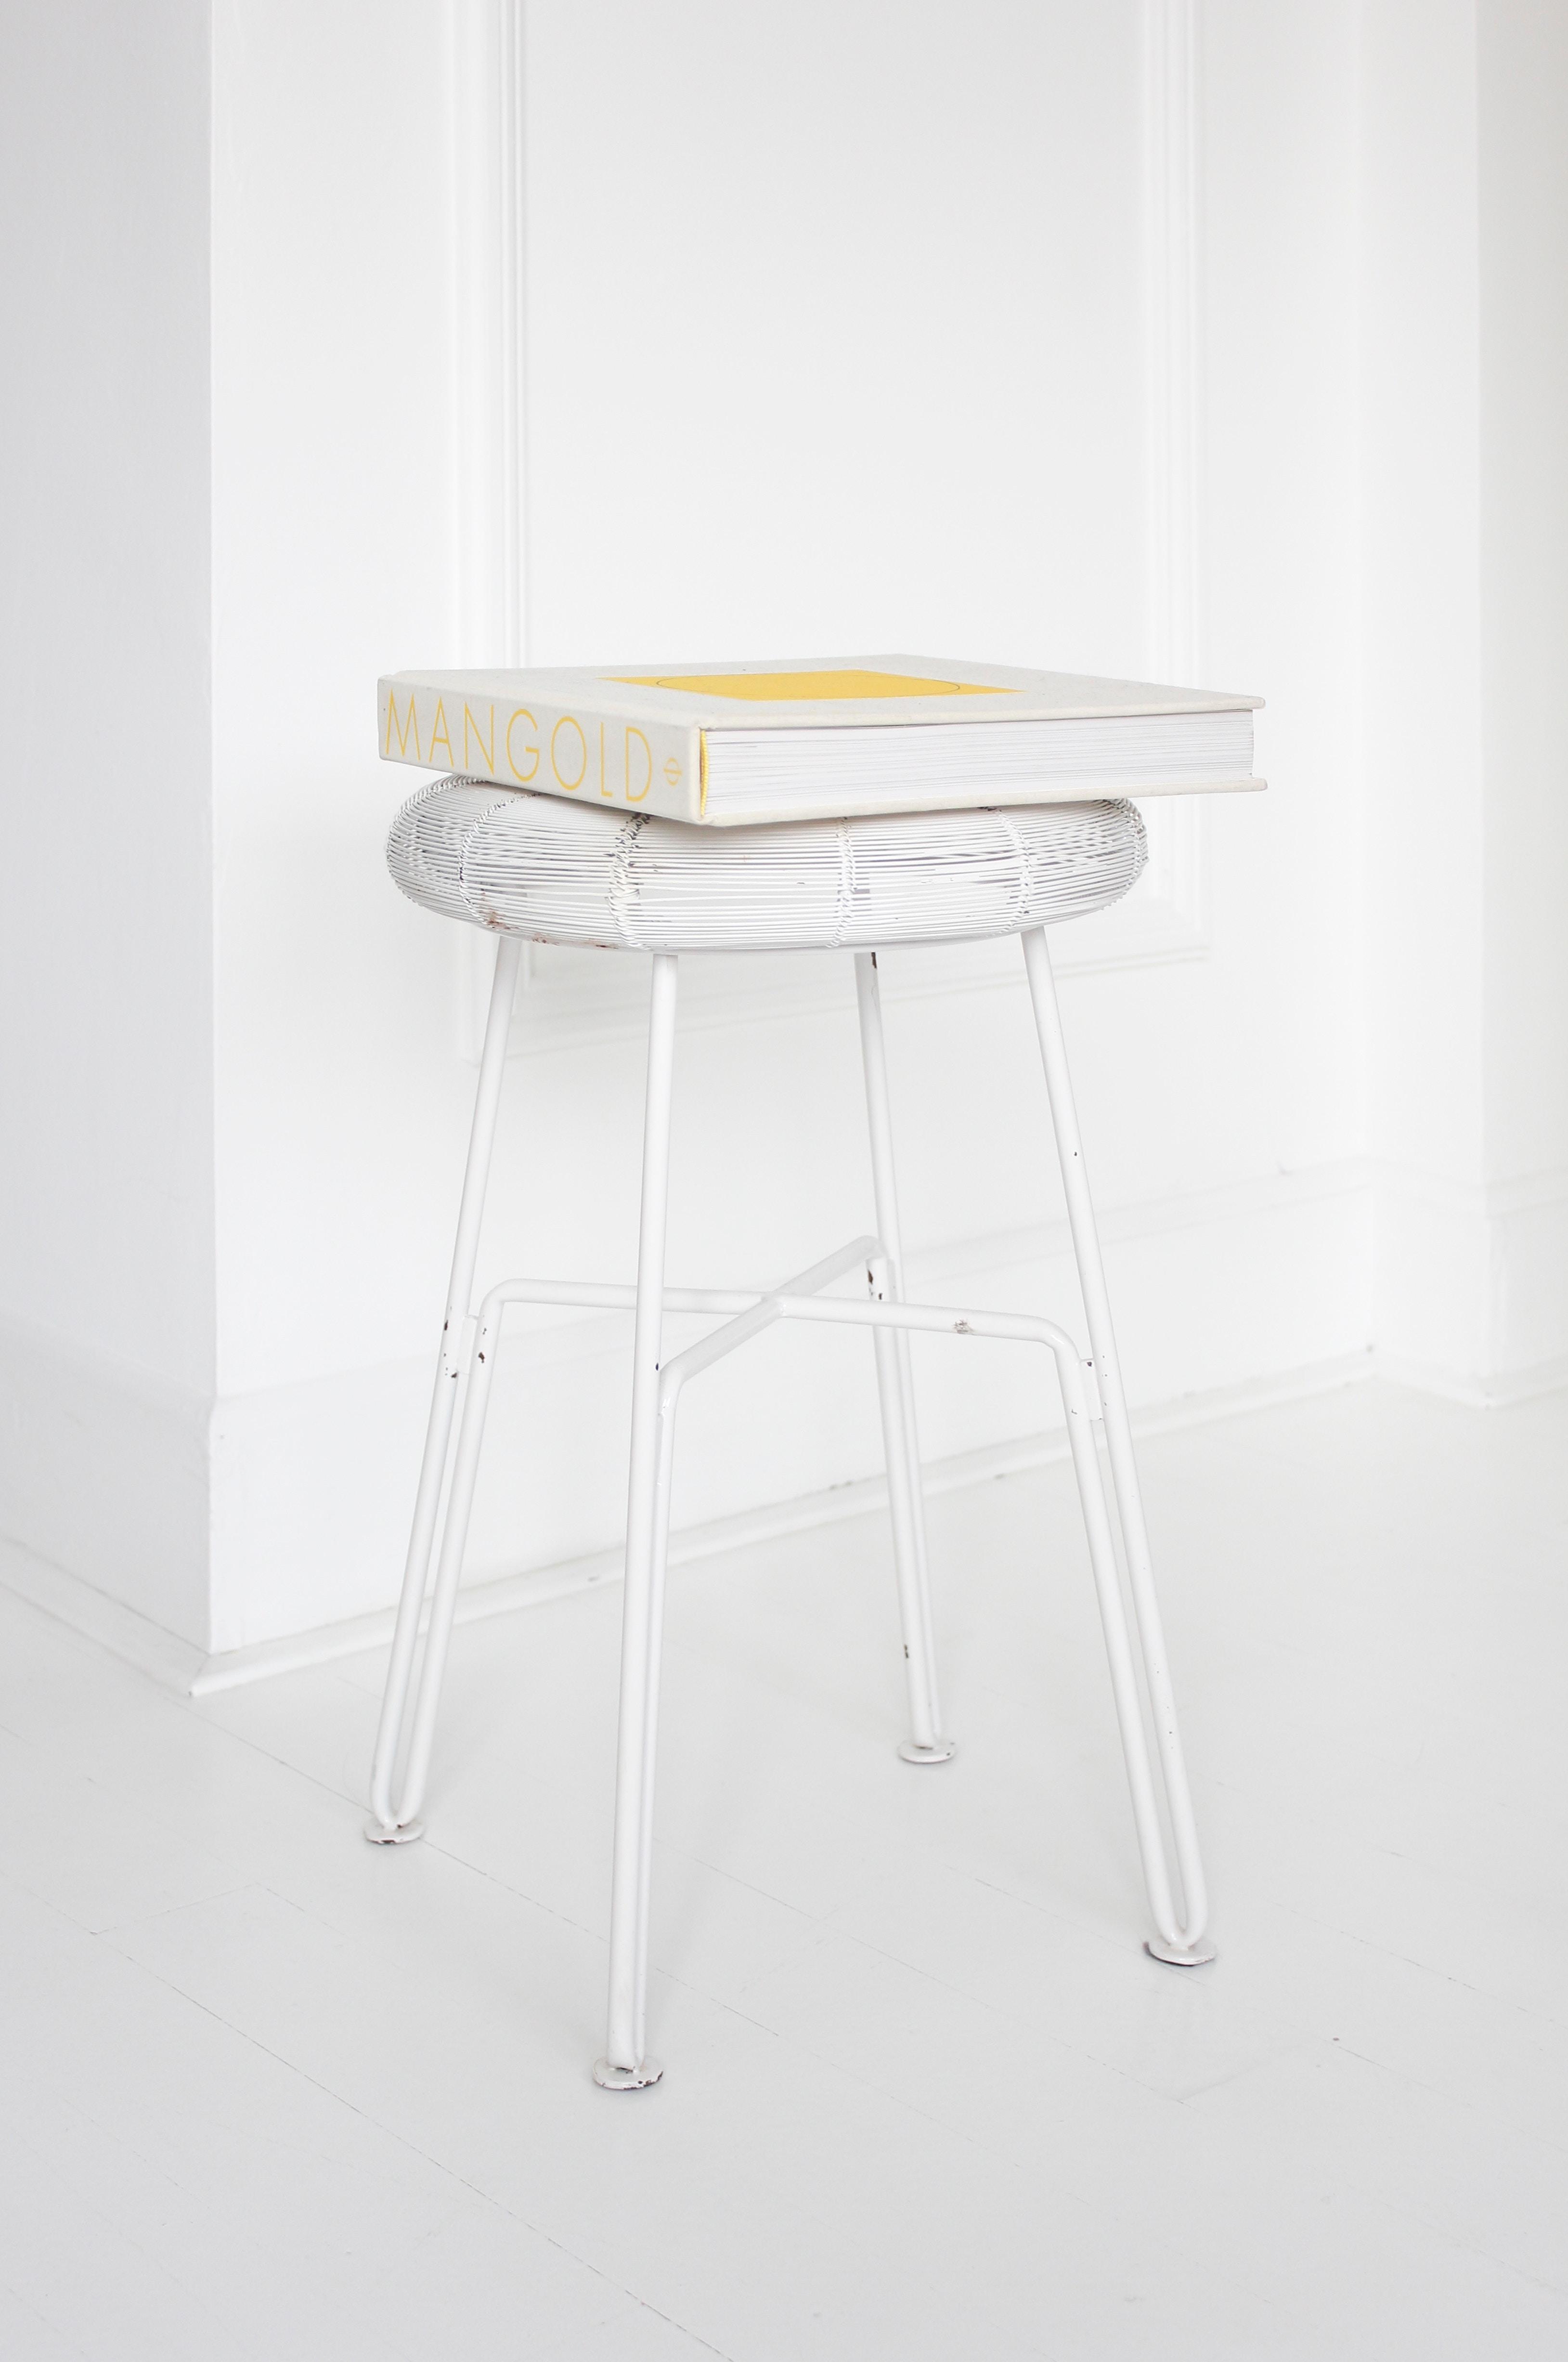 Produktdesign Möbel kostenlose foto tabelle sessel schemel möbel produkt winkel